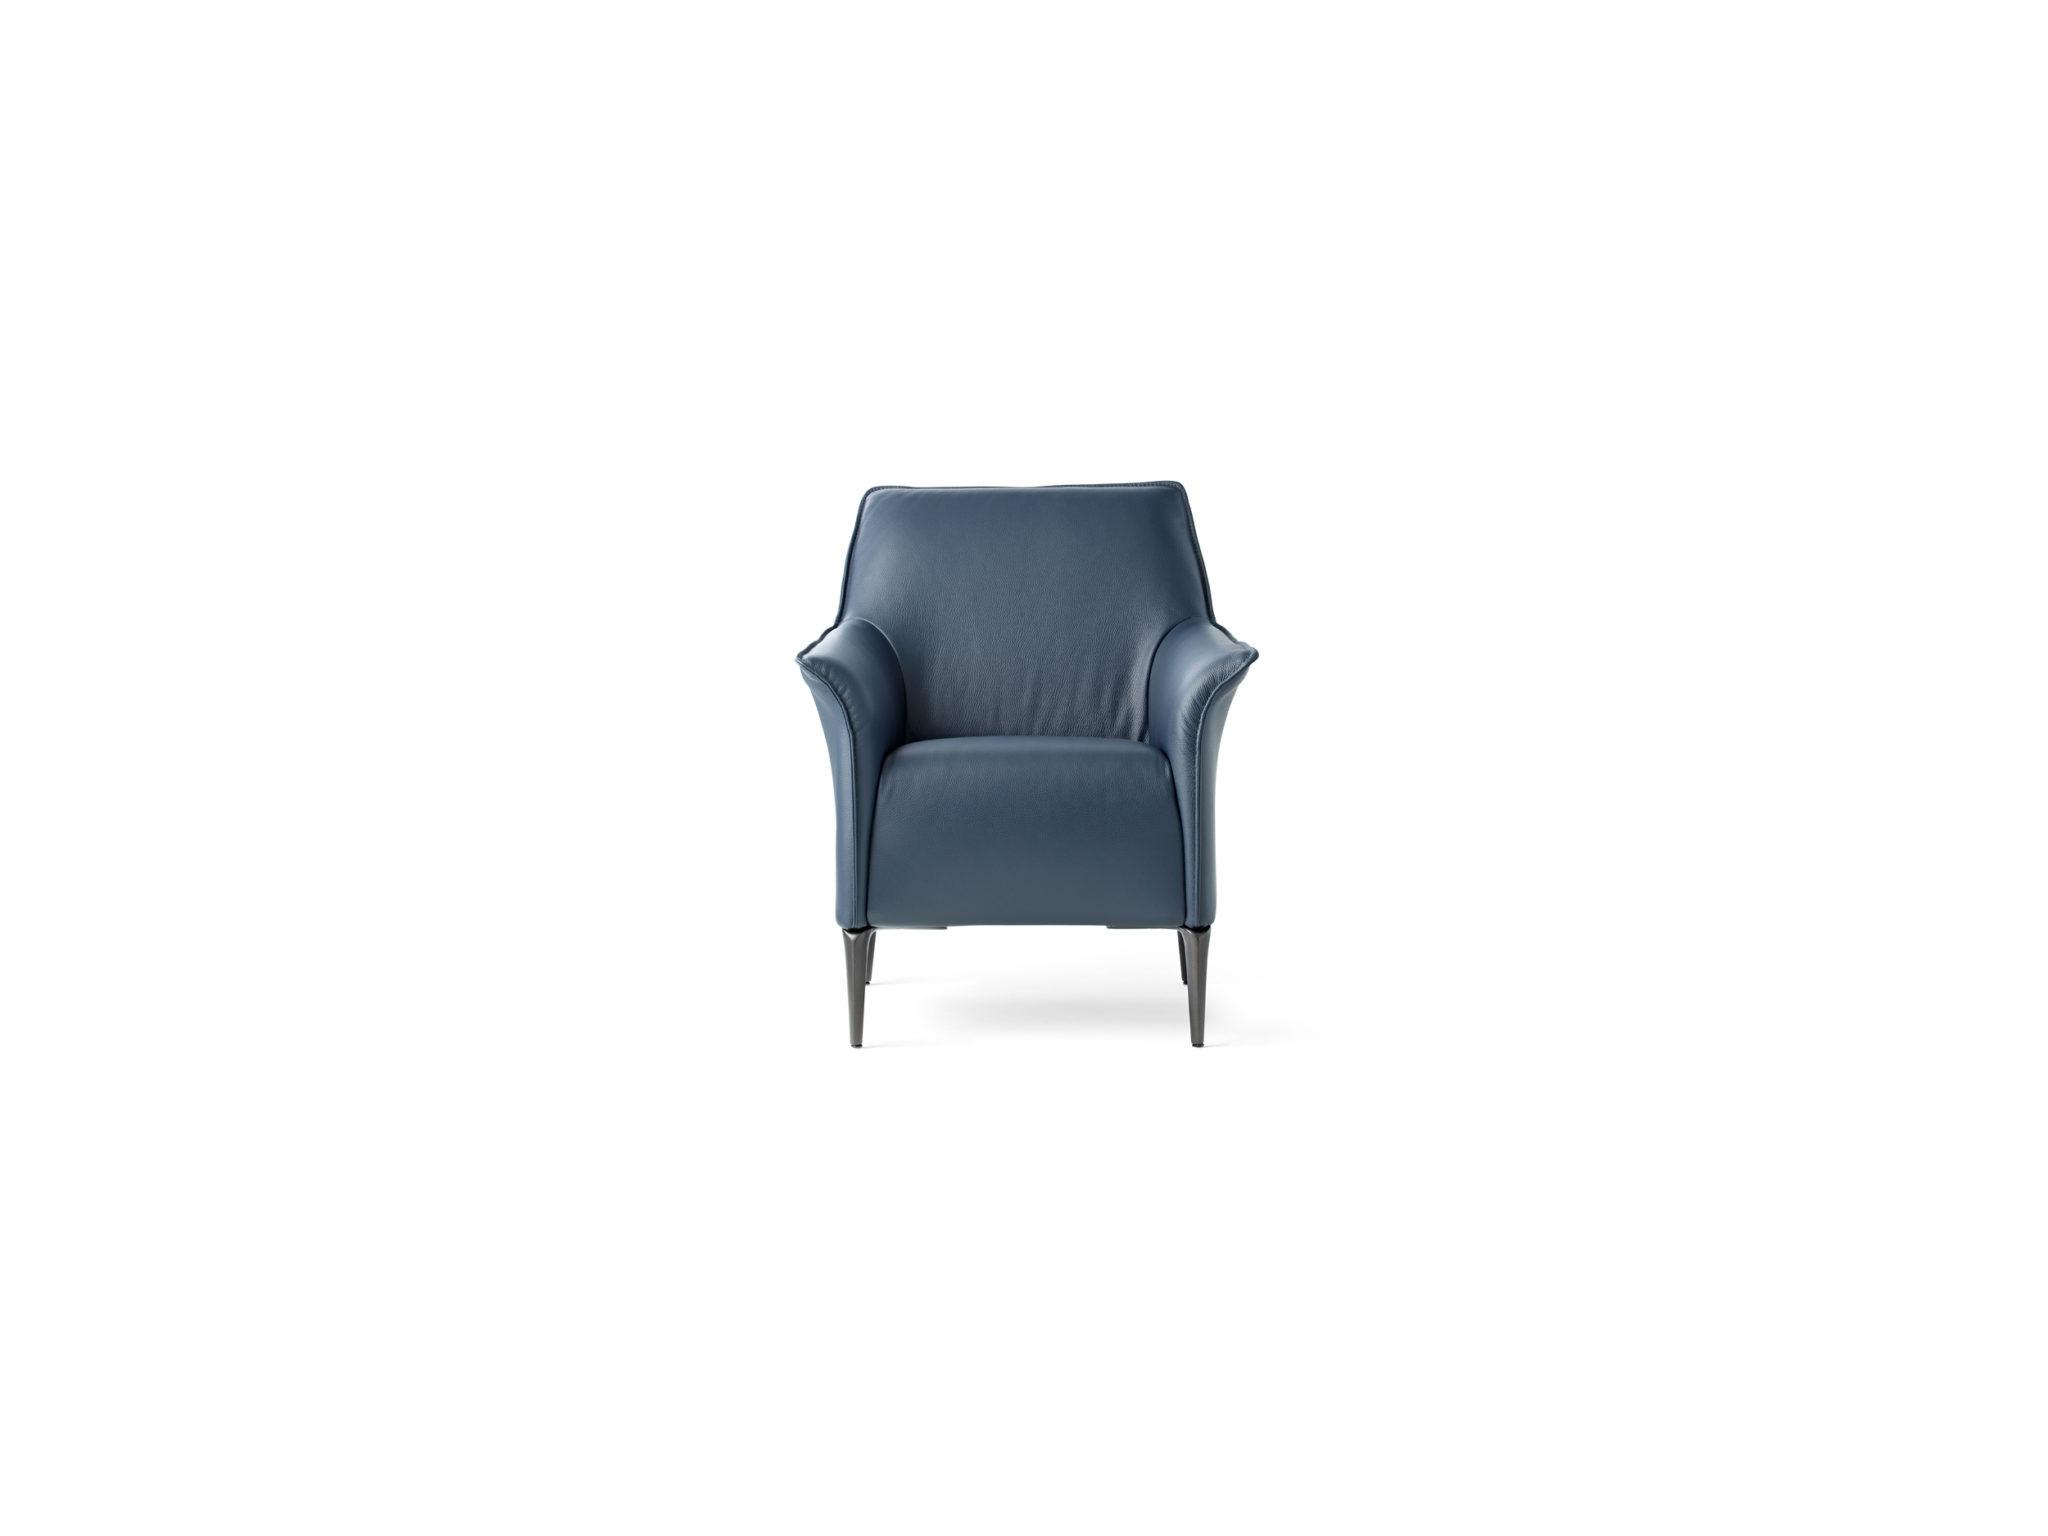 Leolux fauteuil Mayuro pa